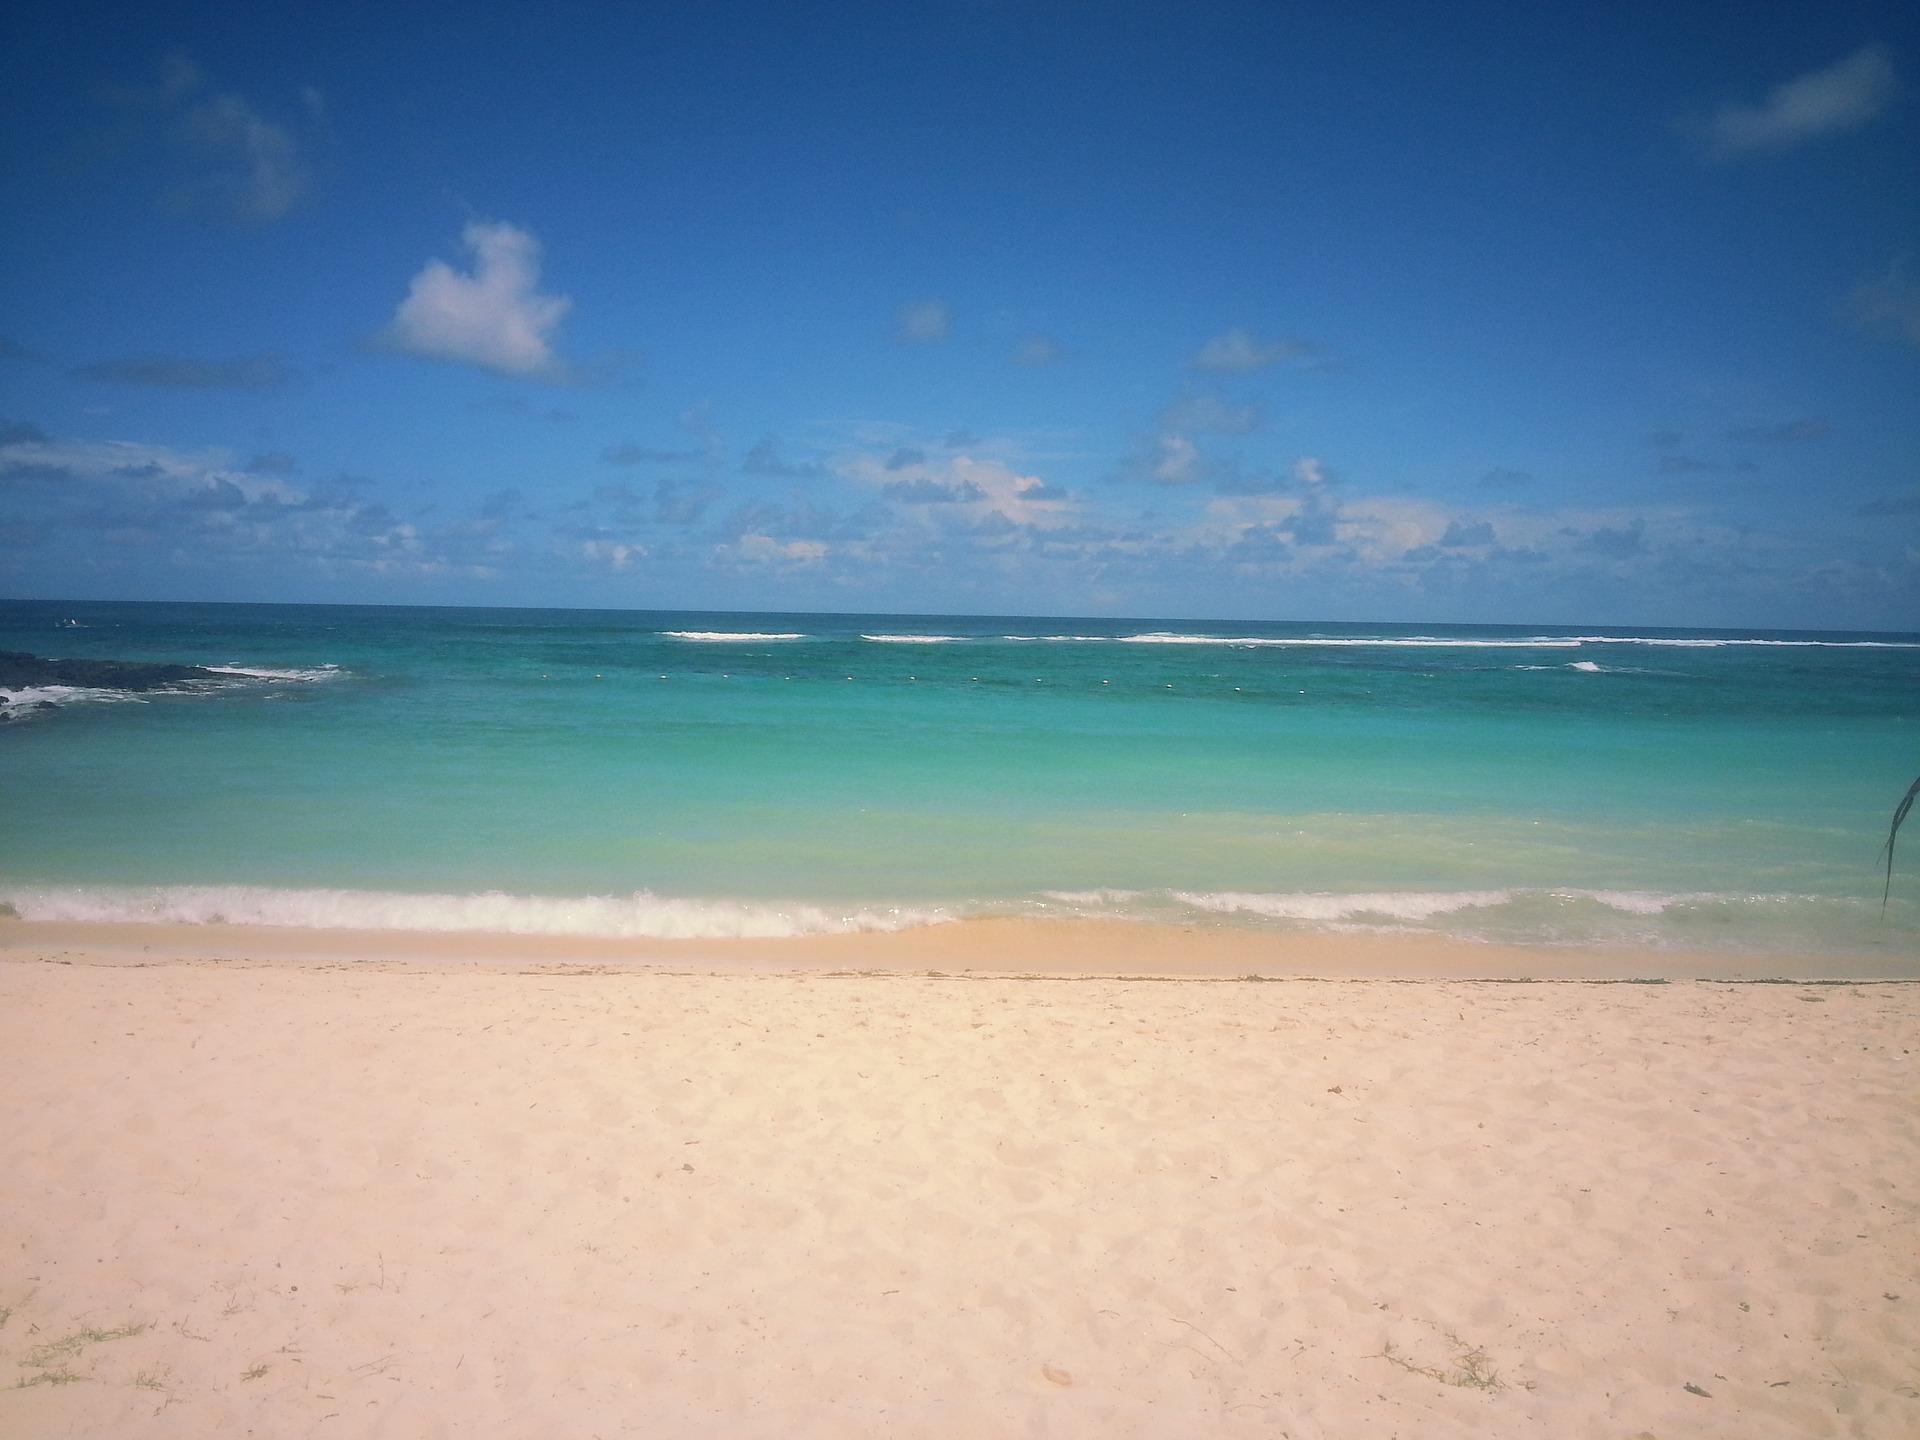 Strand Chilln auf Mauritius Halbpension 8 Nächte ab 900,00€ All Inclusive nur 192,00€ +